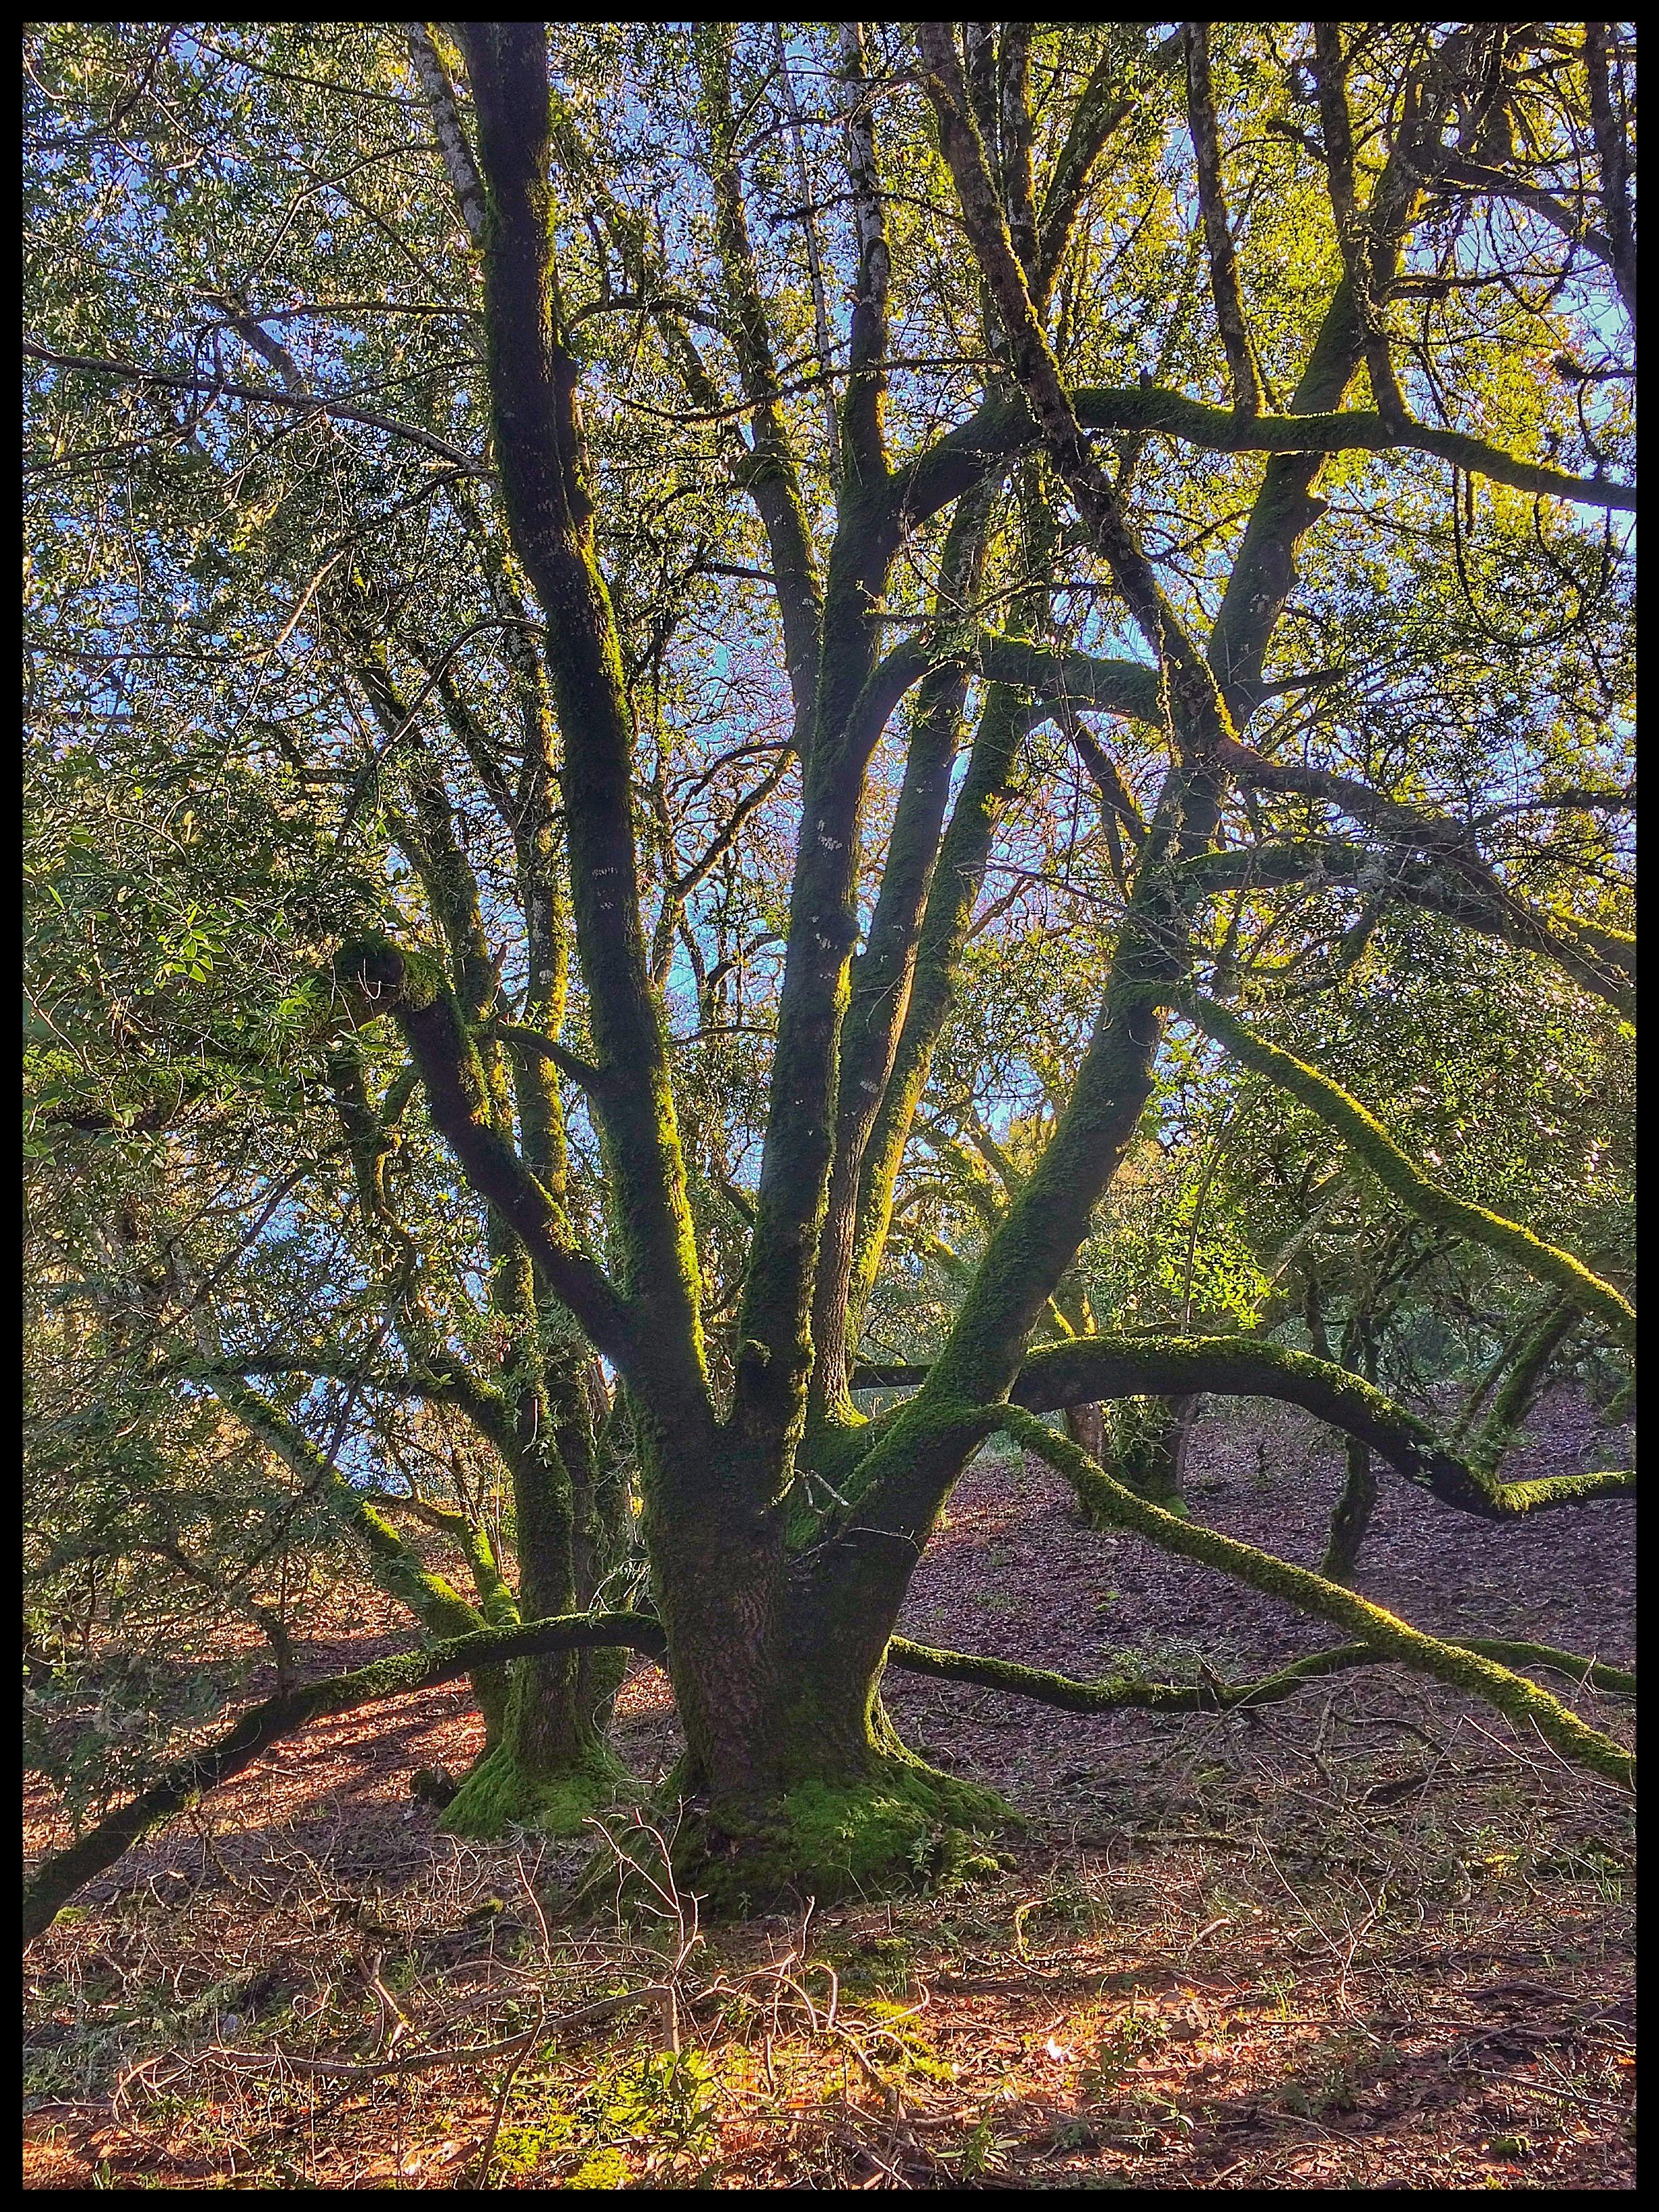 The Mighty Bay Laurel Tree